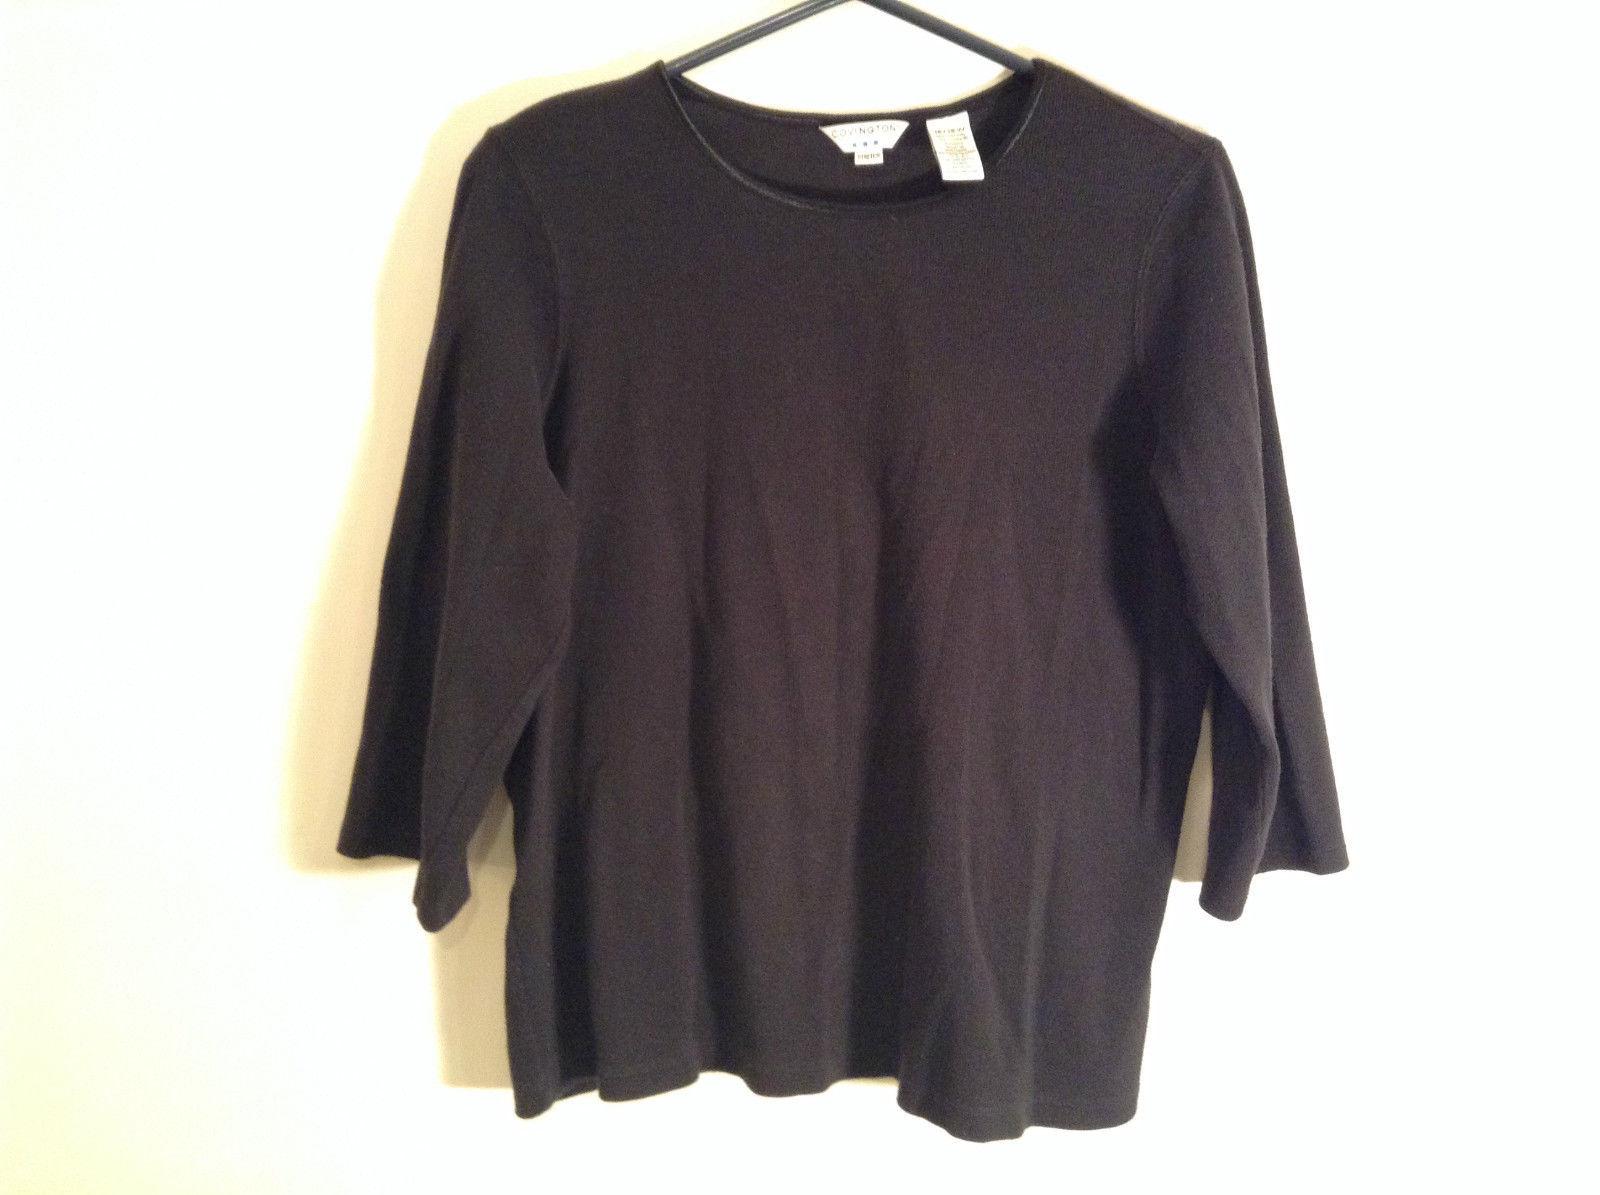 Black Covington Stretch Three Quarter Length Sleeves Sweater Size 16 to 18W